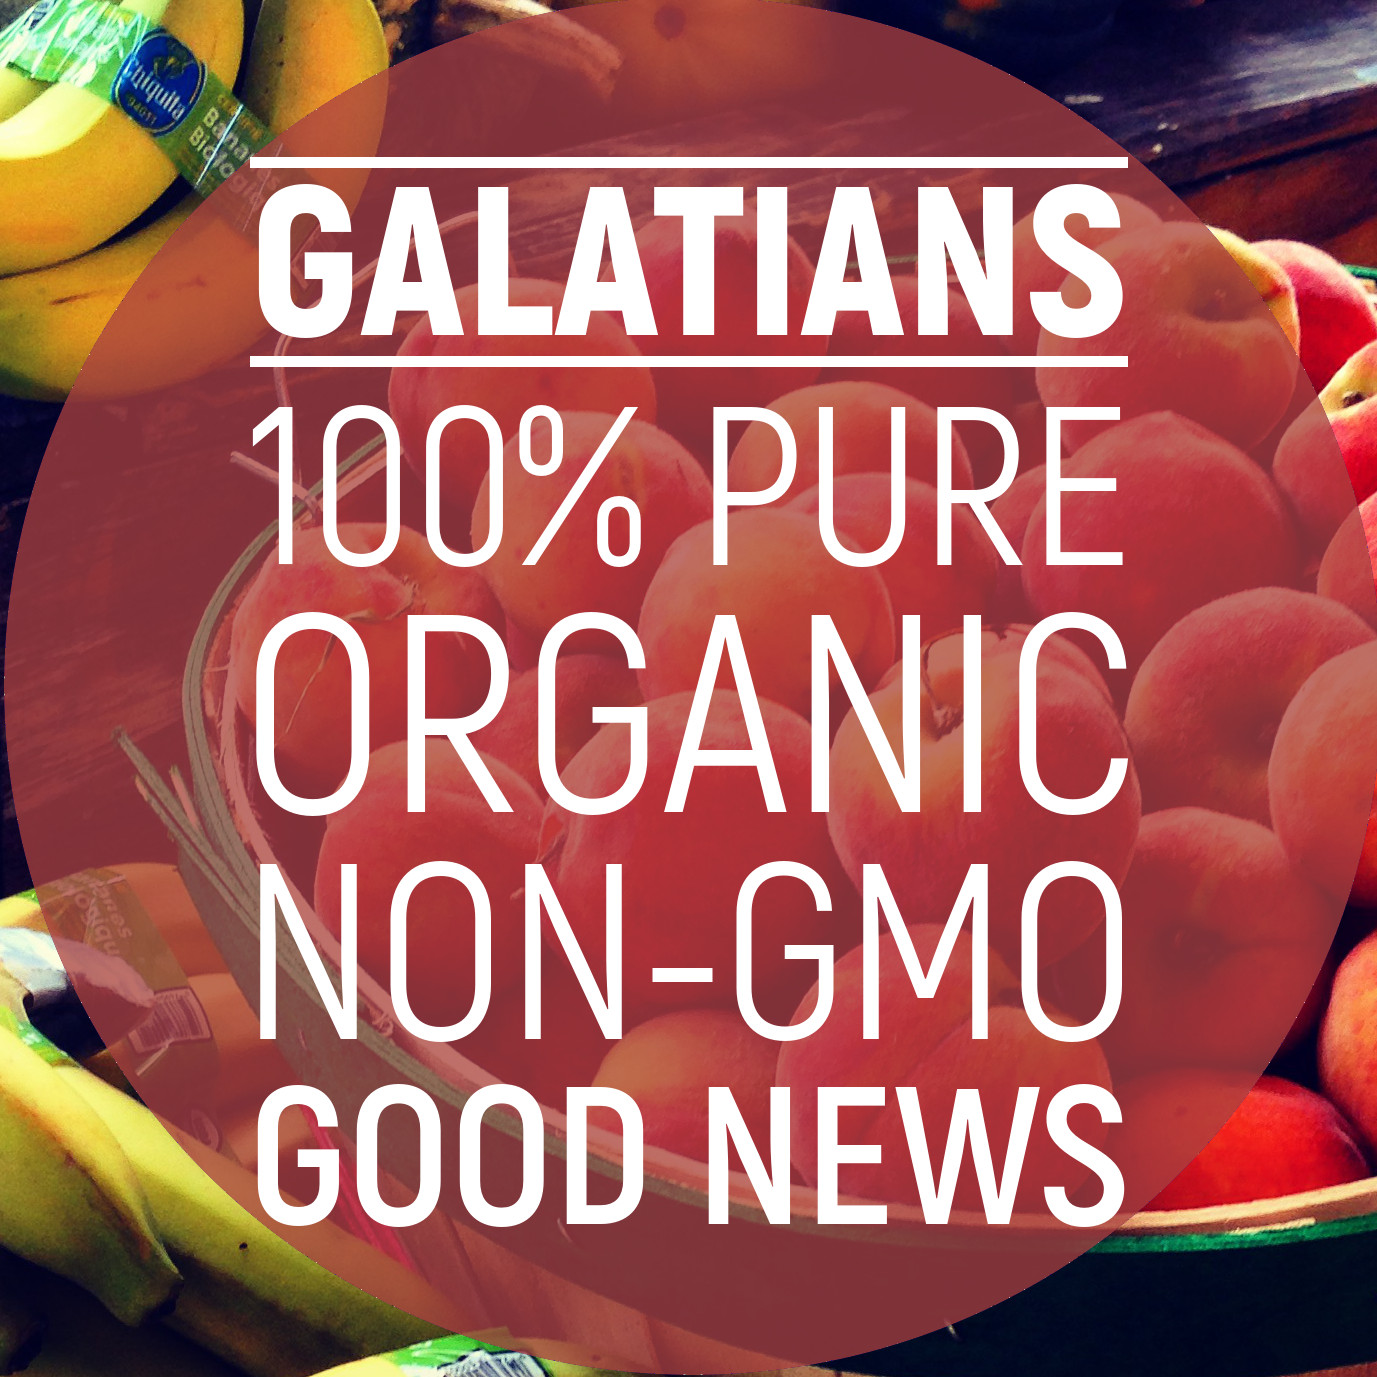 Galatians: 100% Pure, Organic, Non-GMO Good News